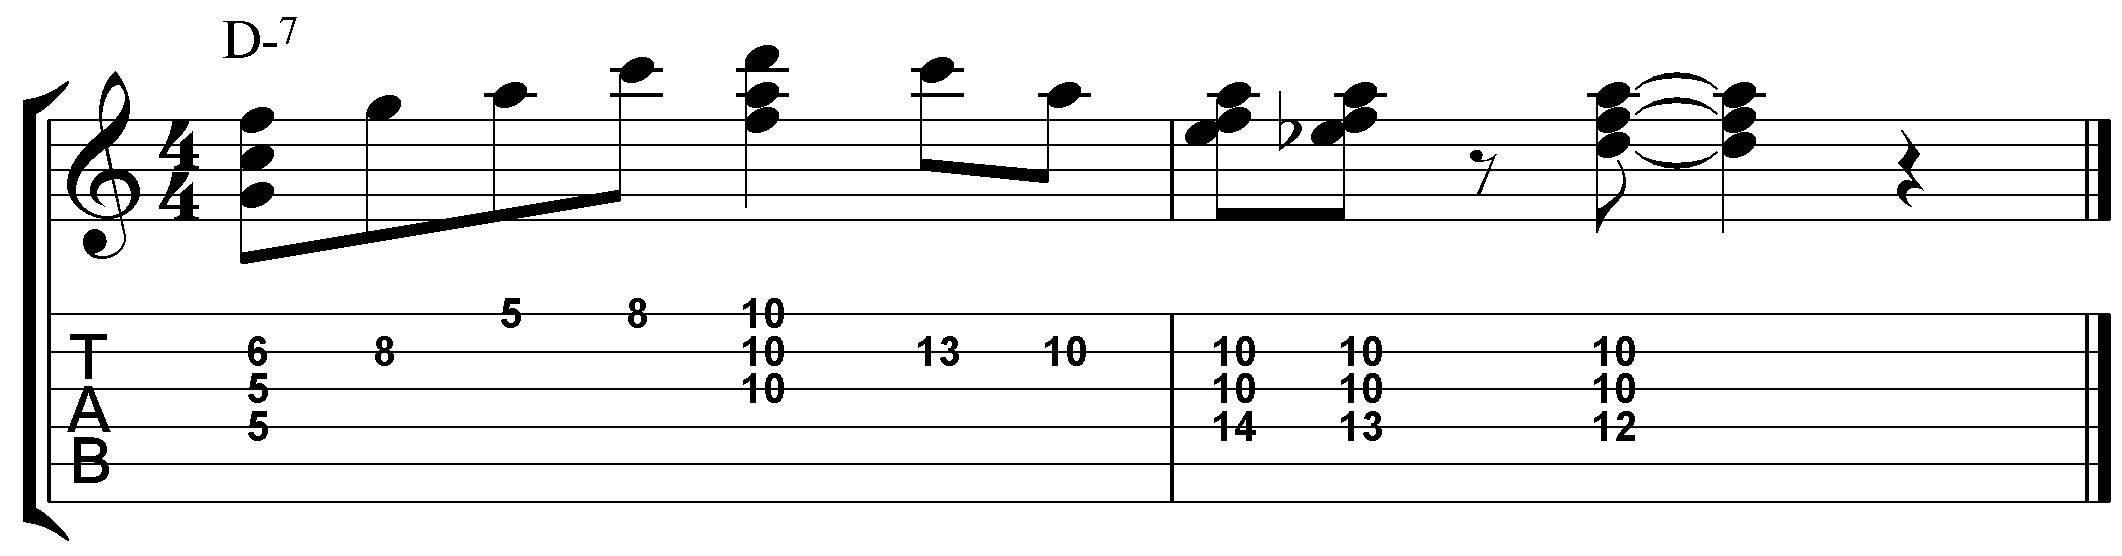 5 Jazz Guitar Chord Studies  D Minor 7 Guitar